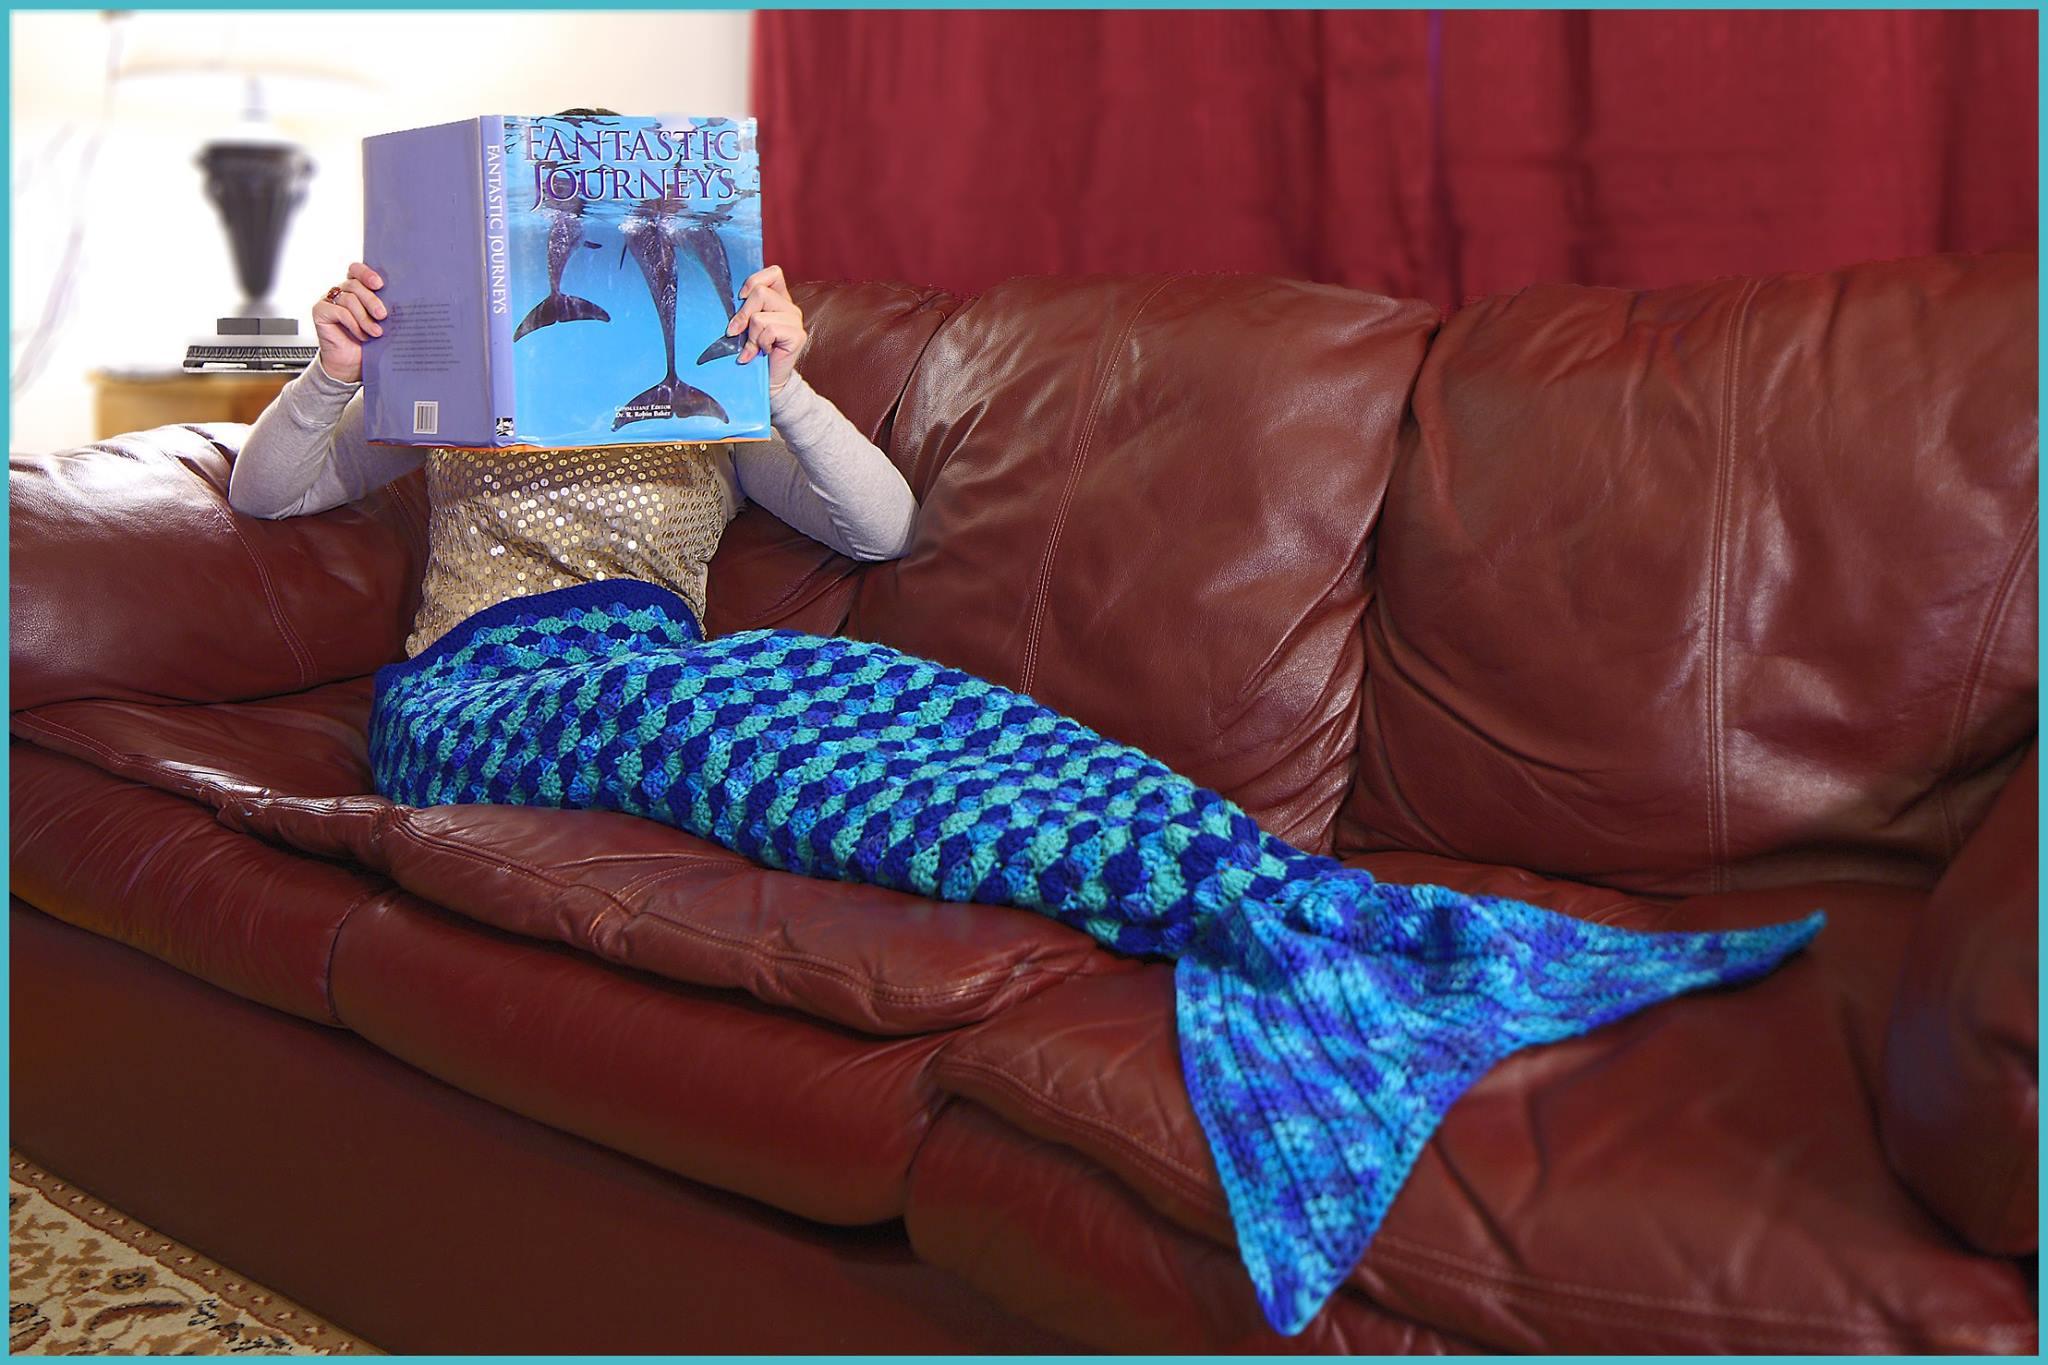 Crochet blanket patterns free uk dating 7